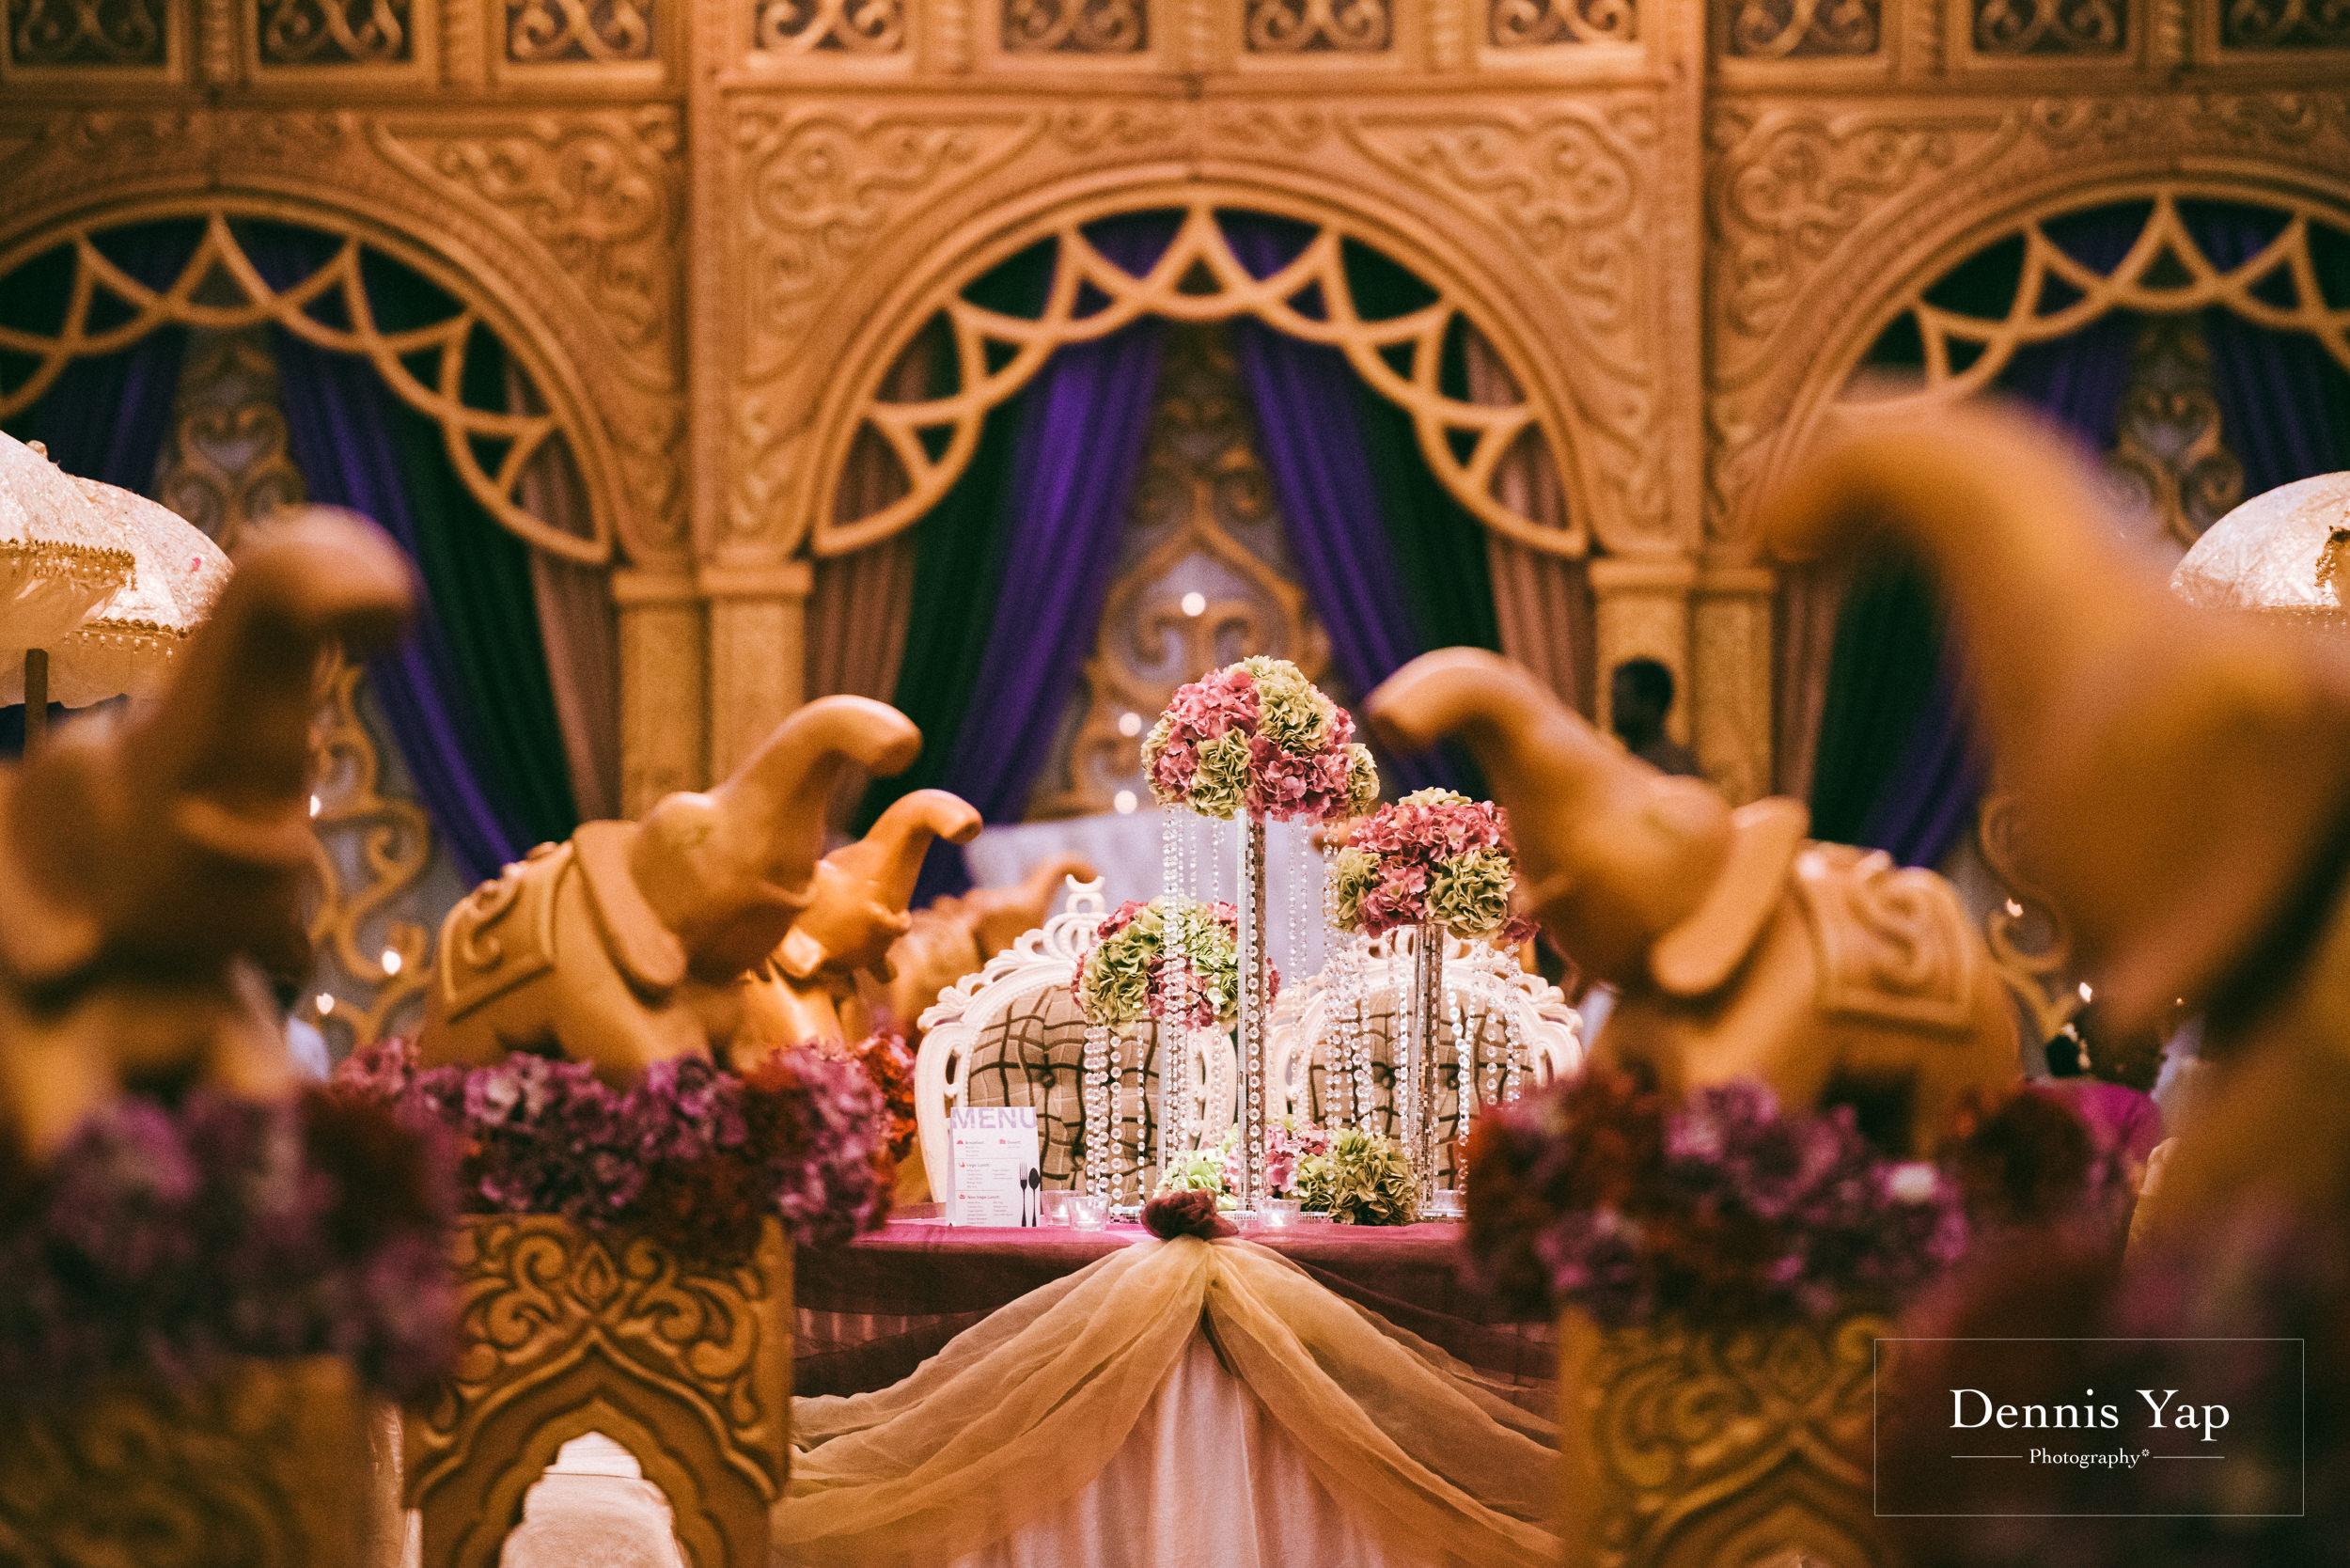 puvaneswaran cangitaa indian wedding ceremony ideal convention dennis yap photography malaysia-7.jpg